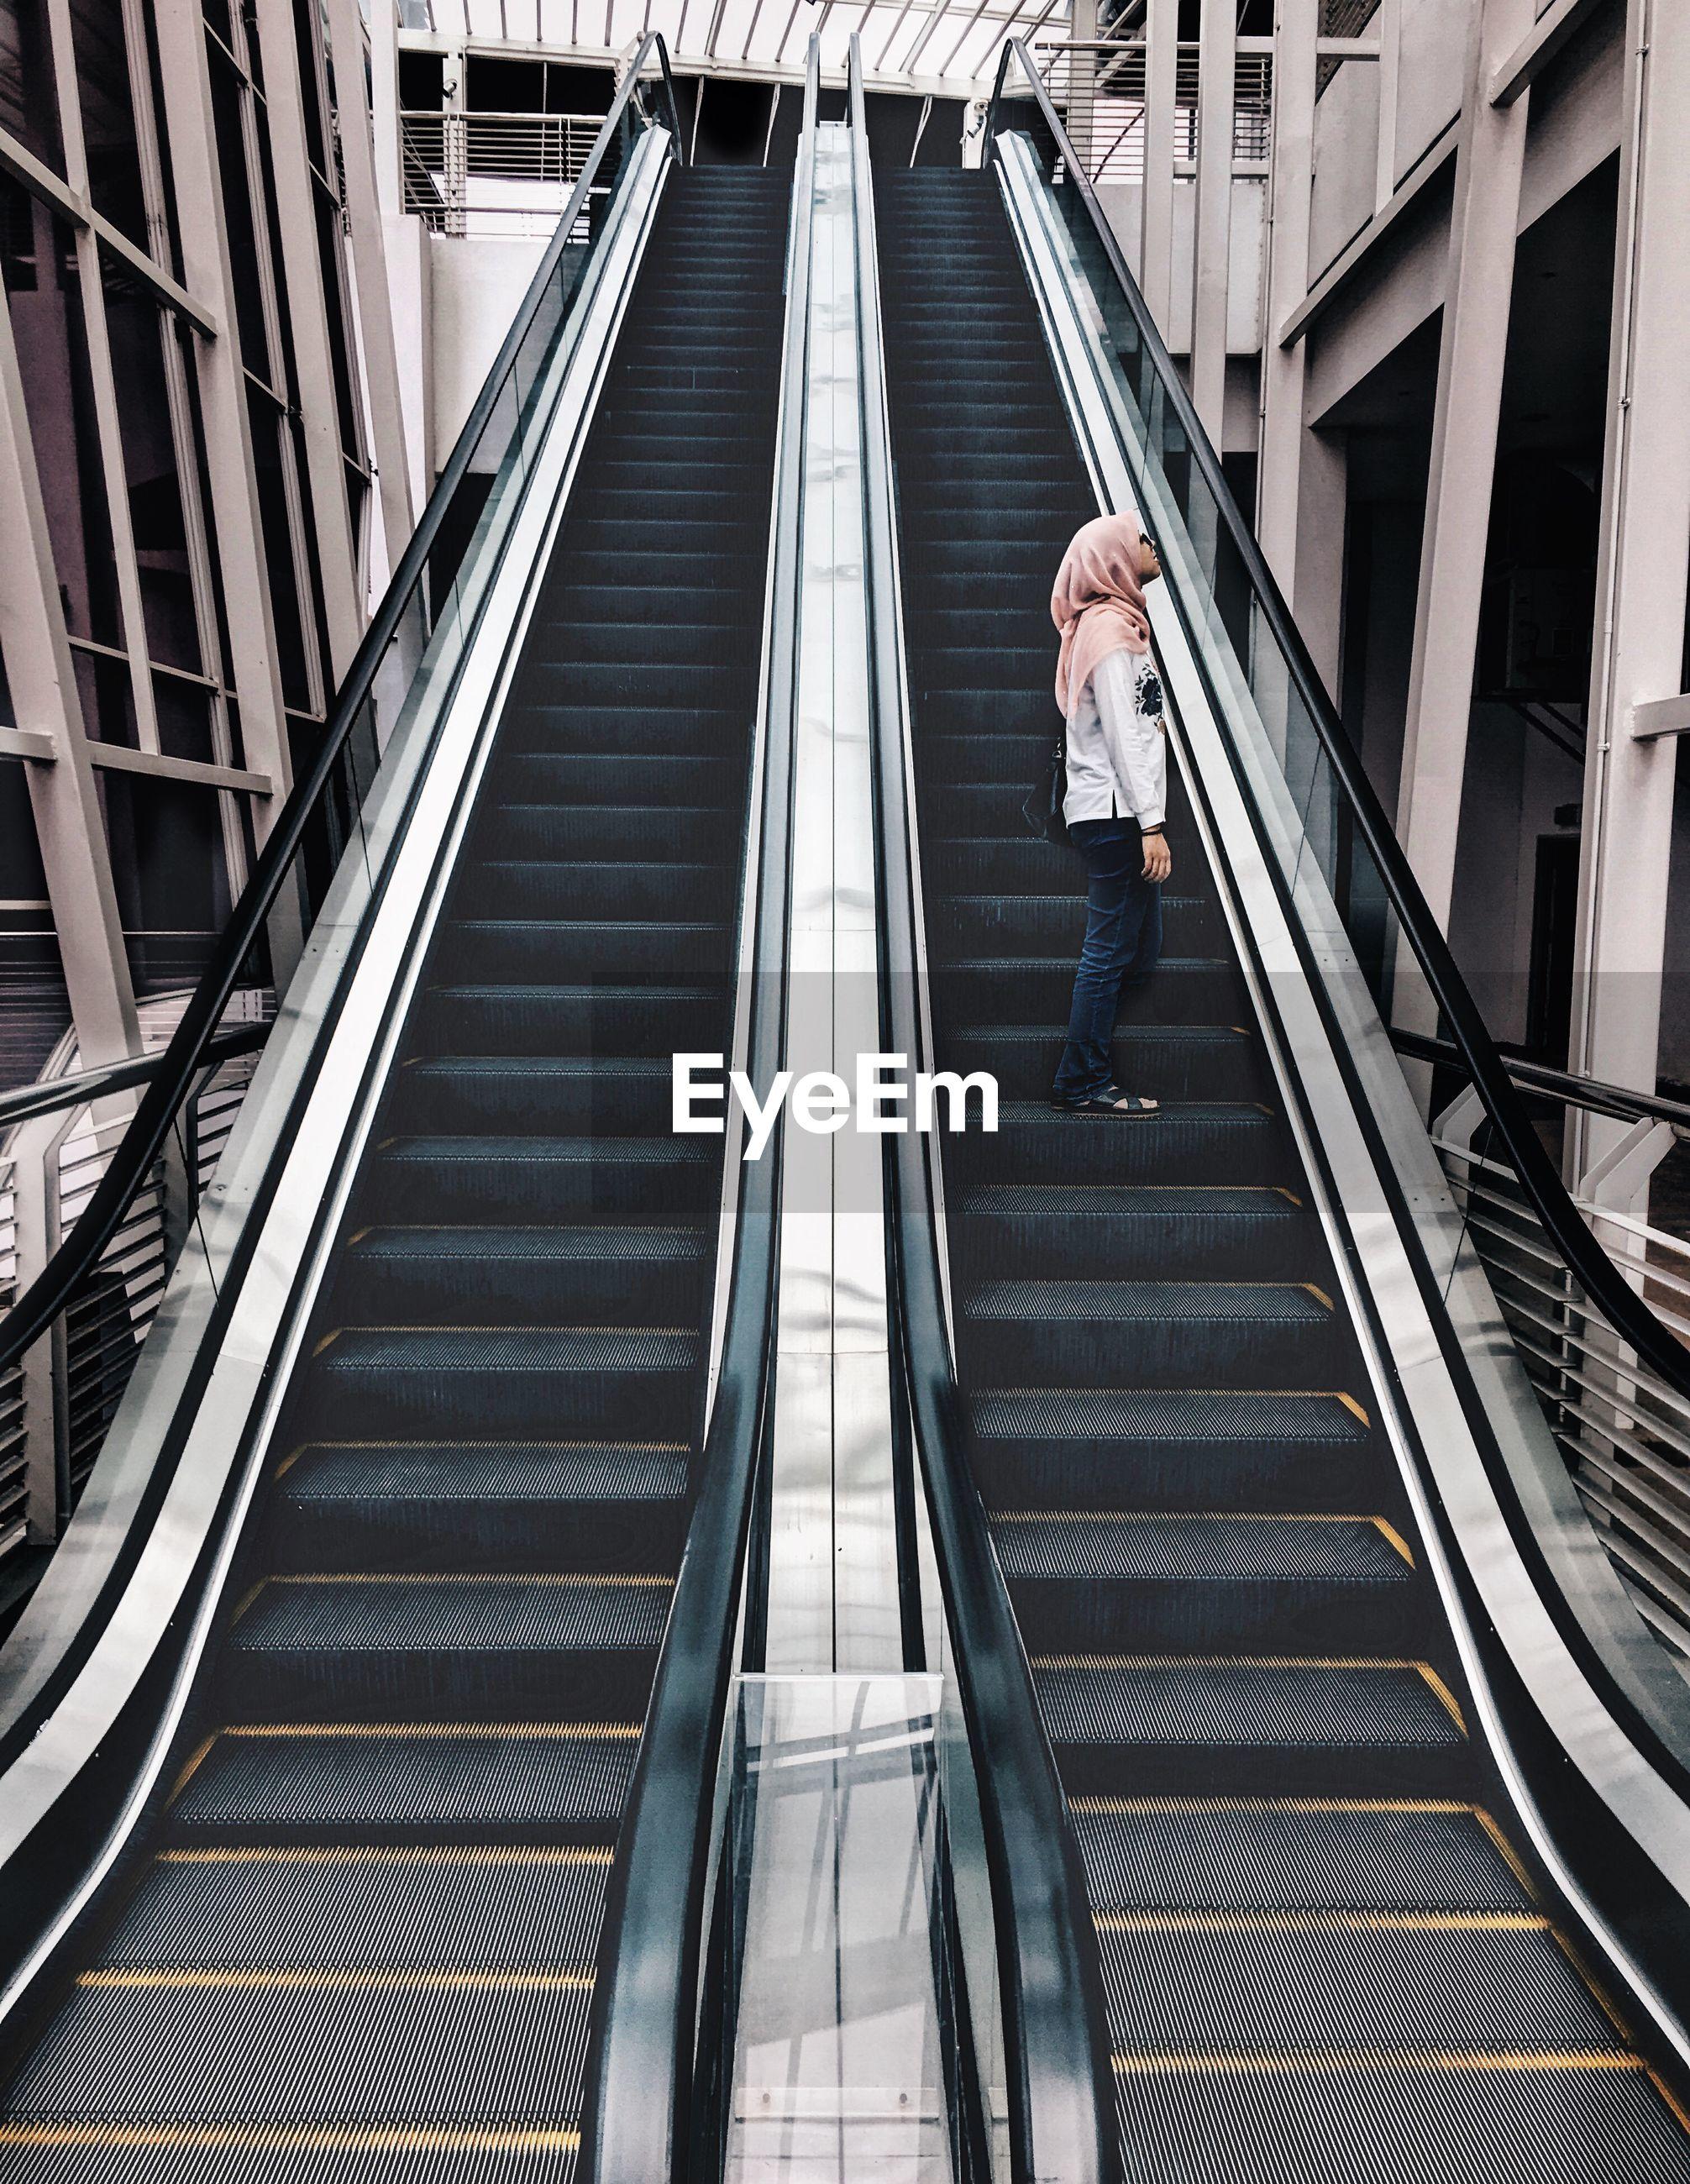 Woman standing on escalator